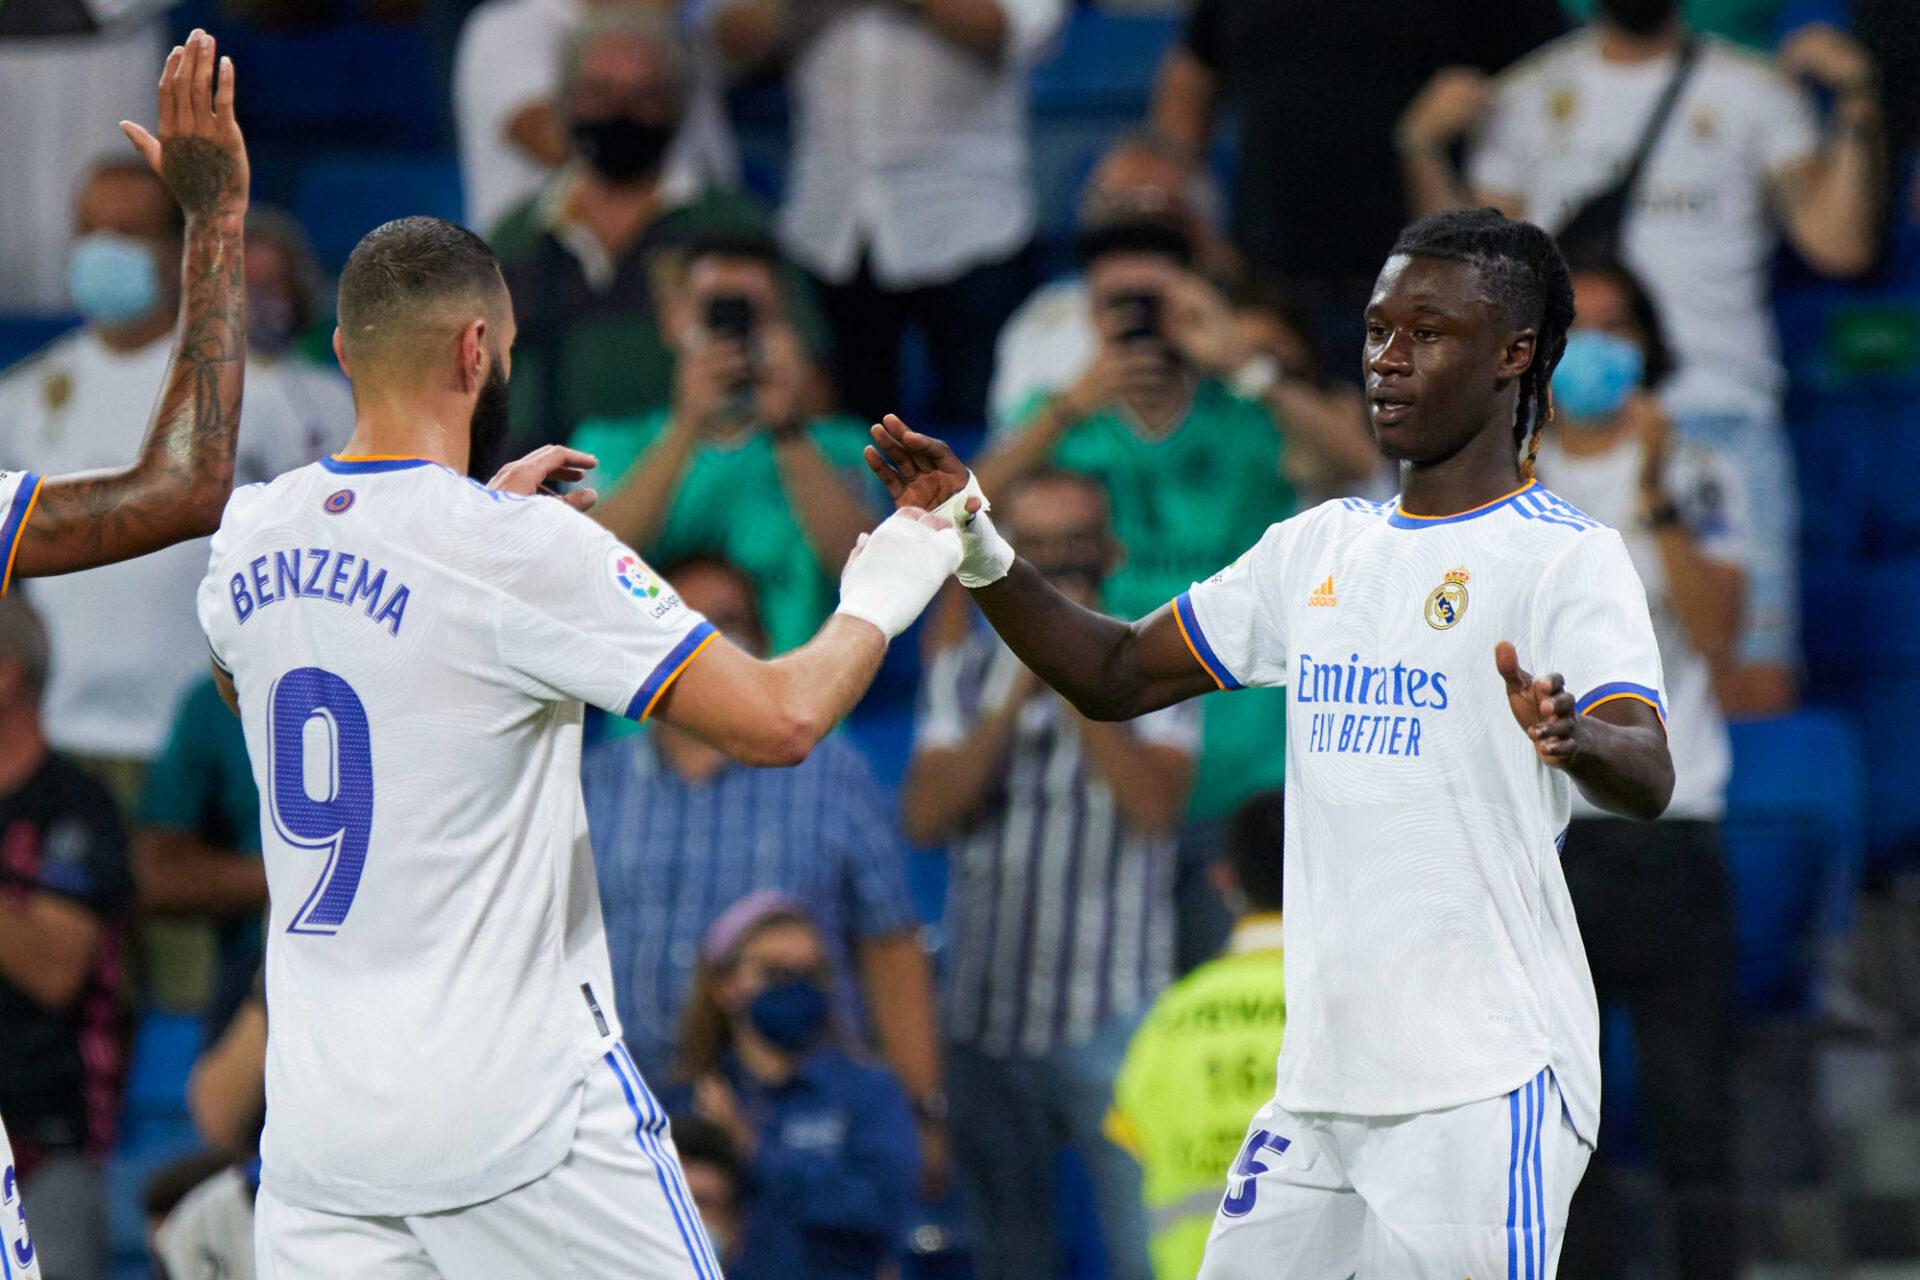 Eduardo Camavinga peut compter sur son compatriote Karim Benzema pour s'intégrer au Real Madrid. Icon Sport